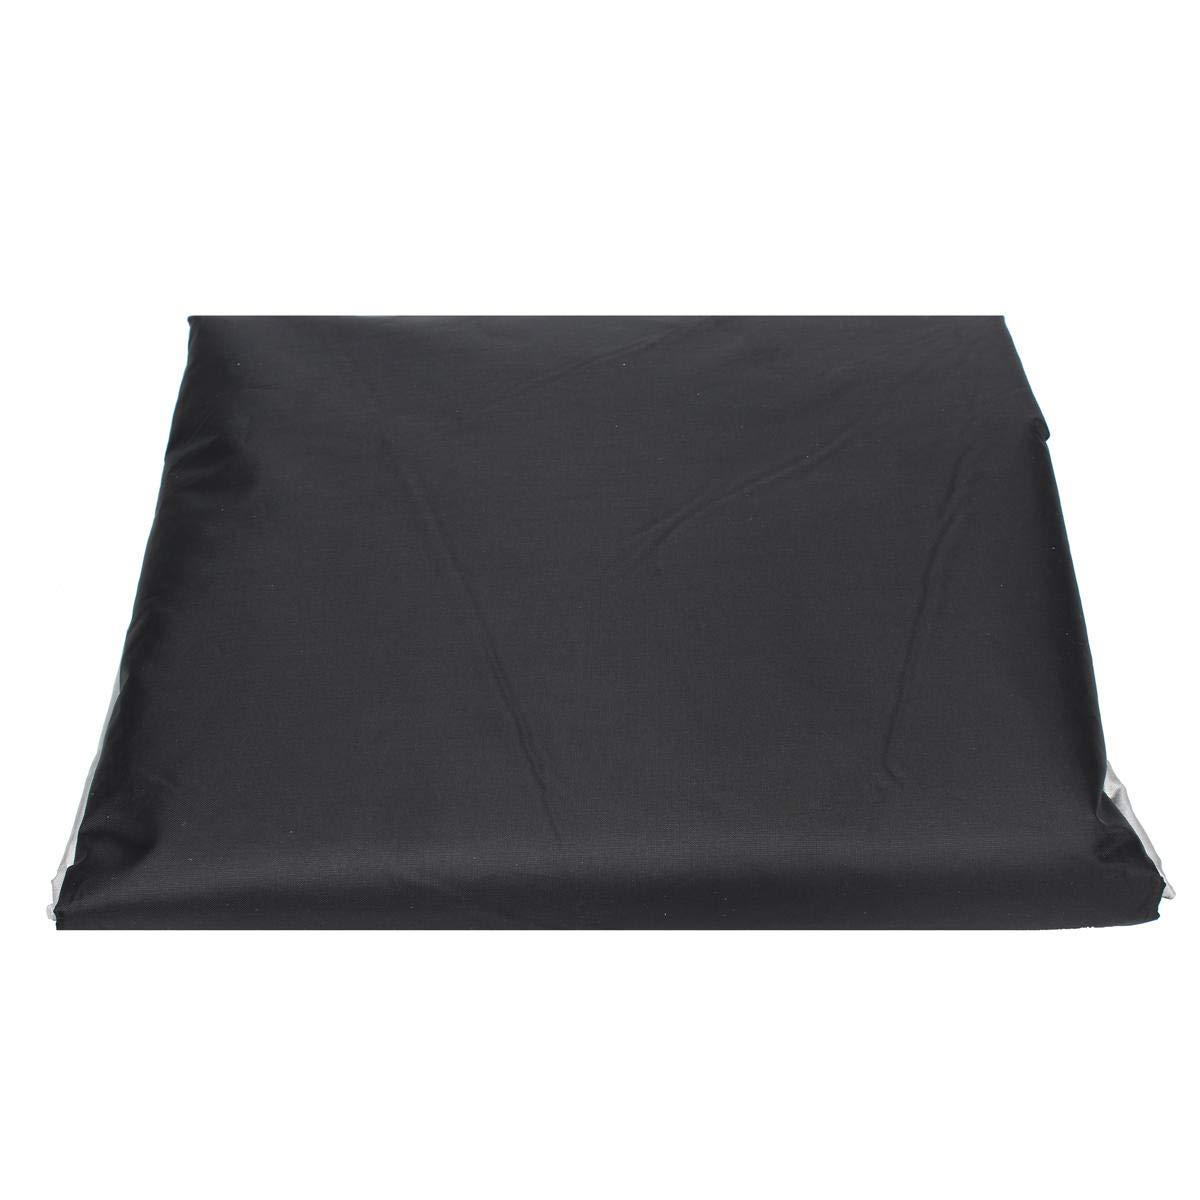 Patio Furniture Winter Cover - 1PCs